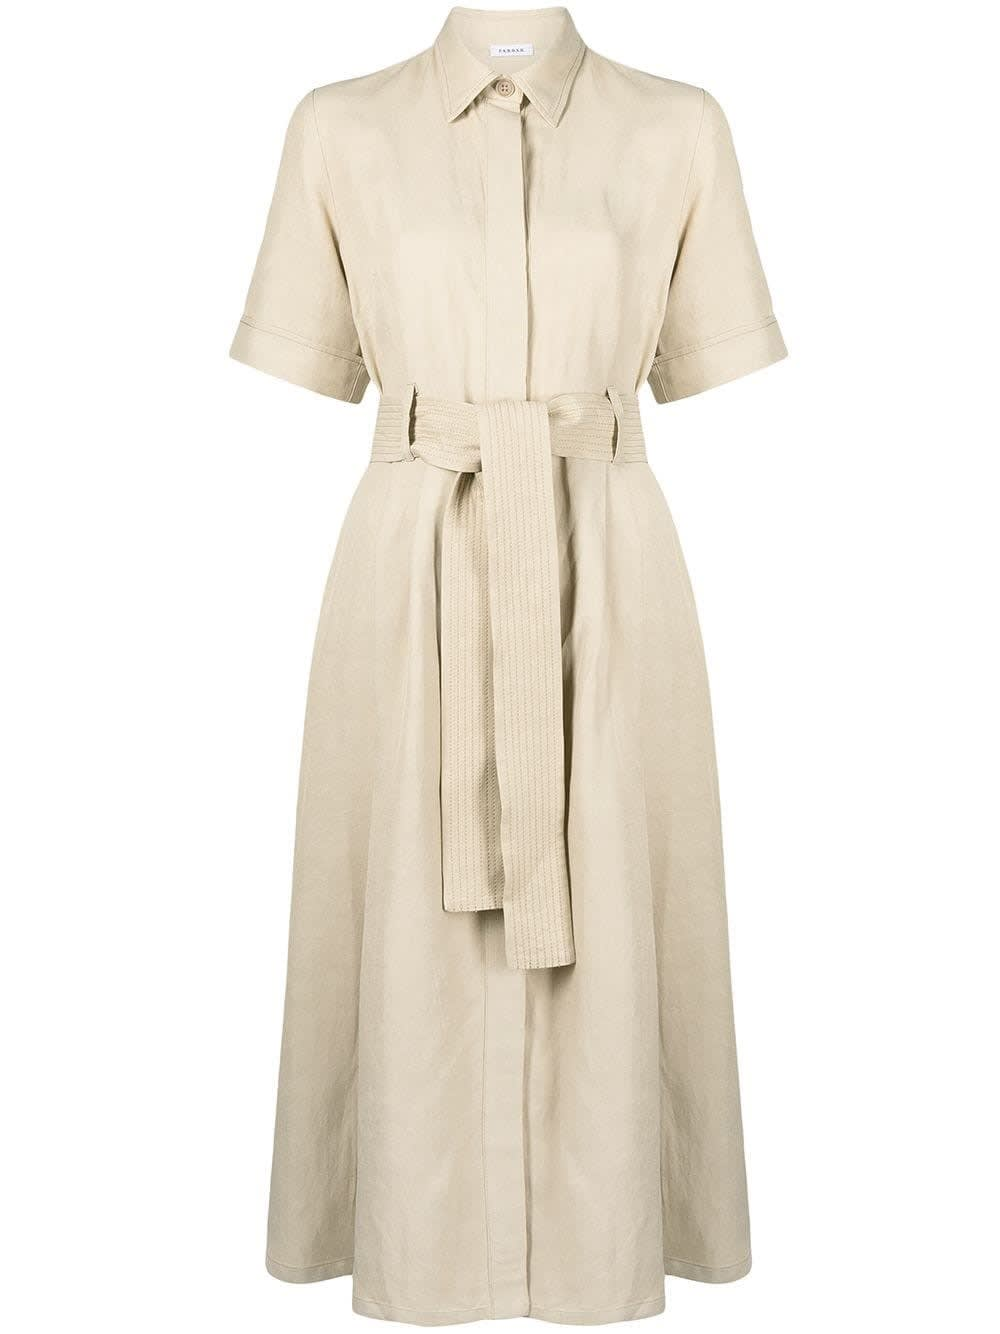 P.a.r.o.s.h. RAISA BEIGE CHEMISIER DRESS IN VISCOSE BLEND